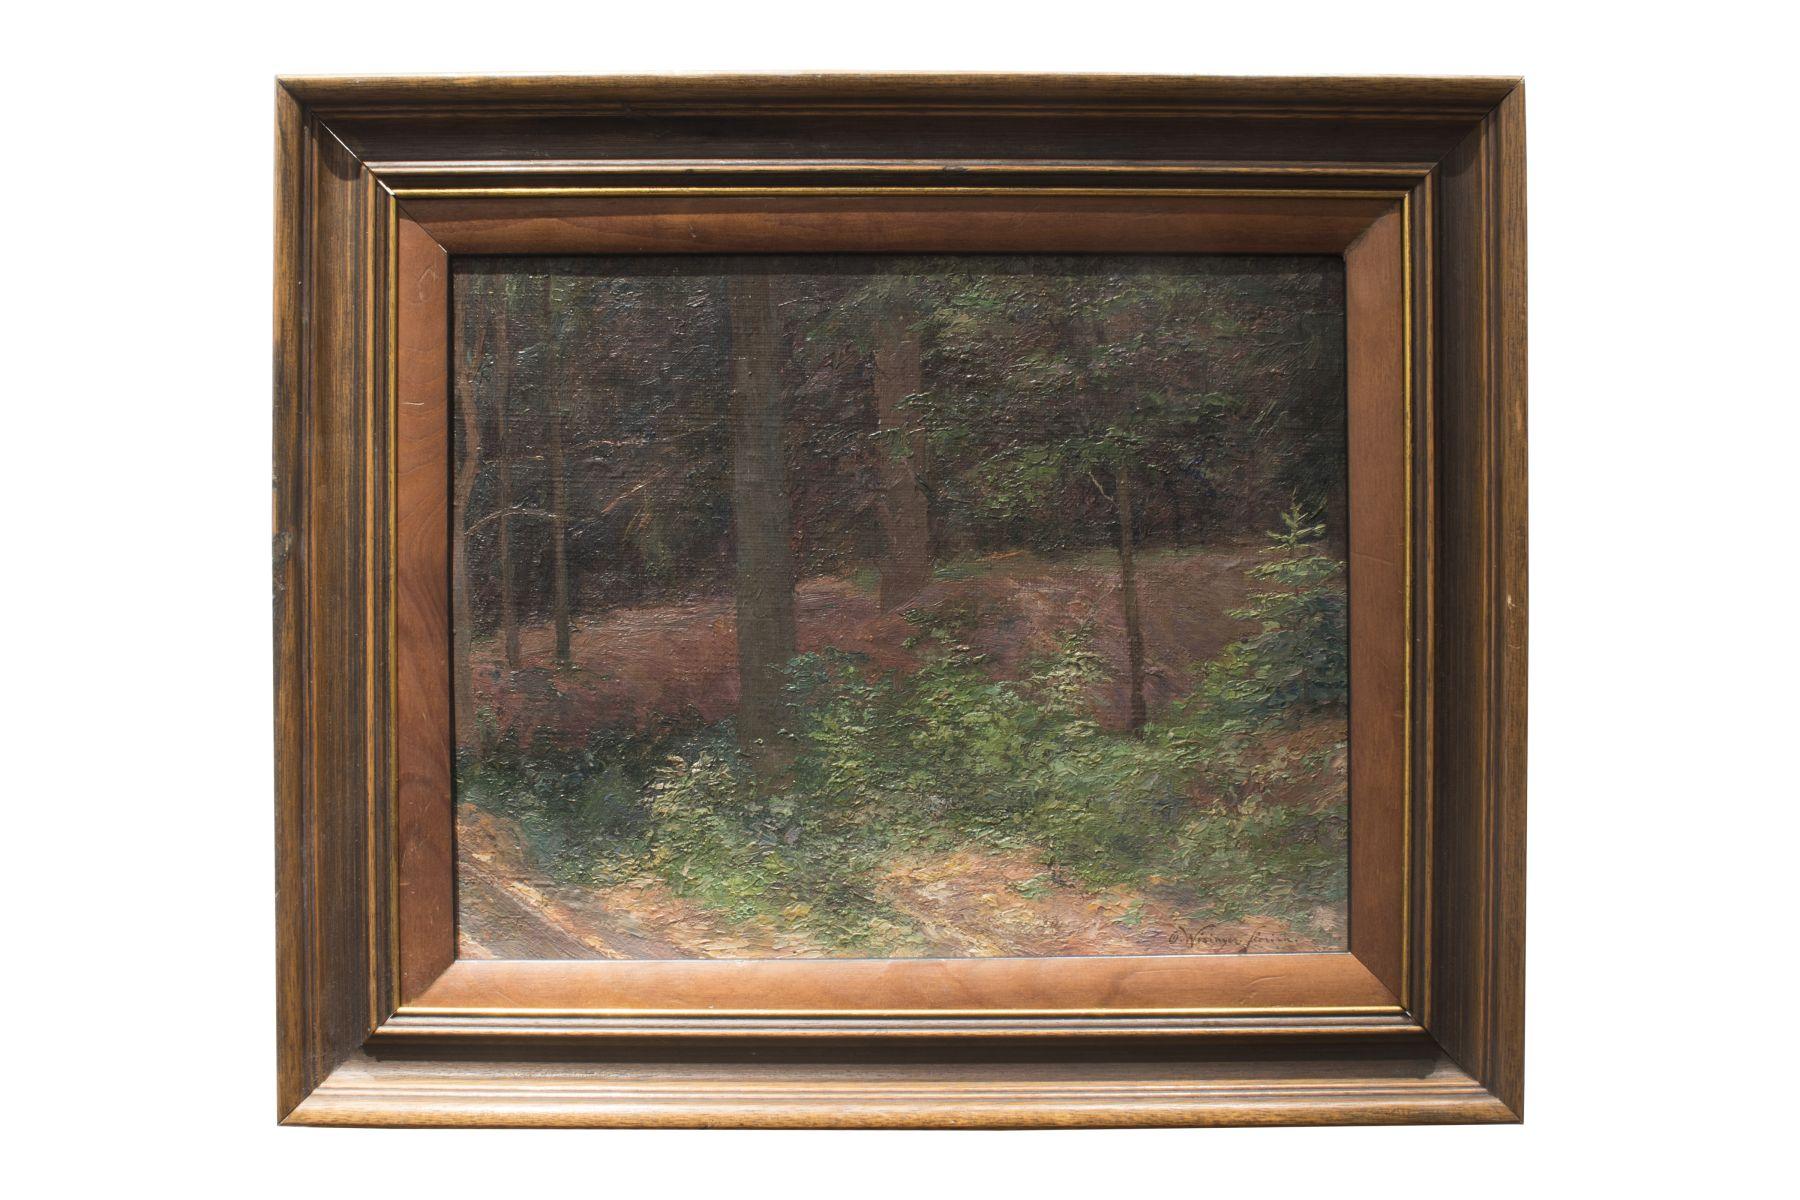 "#153 Olga Wisinger-Florian (1844-1926) ""Clearing in the Woods"" | Olga Wisinger-Florian (1844-1926) ""Waldlichtung"" Image"